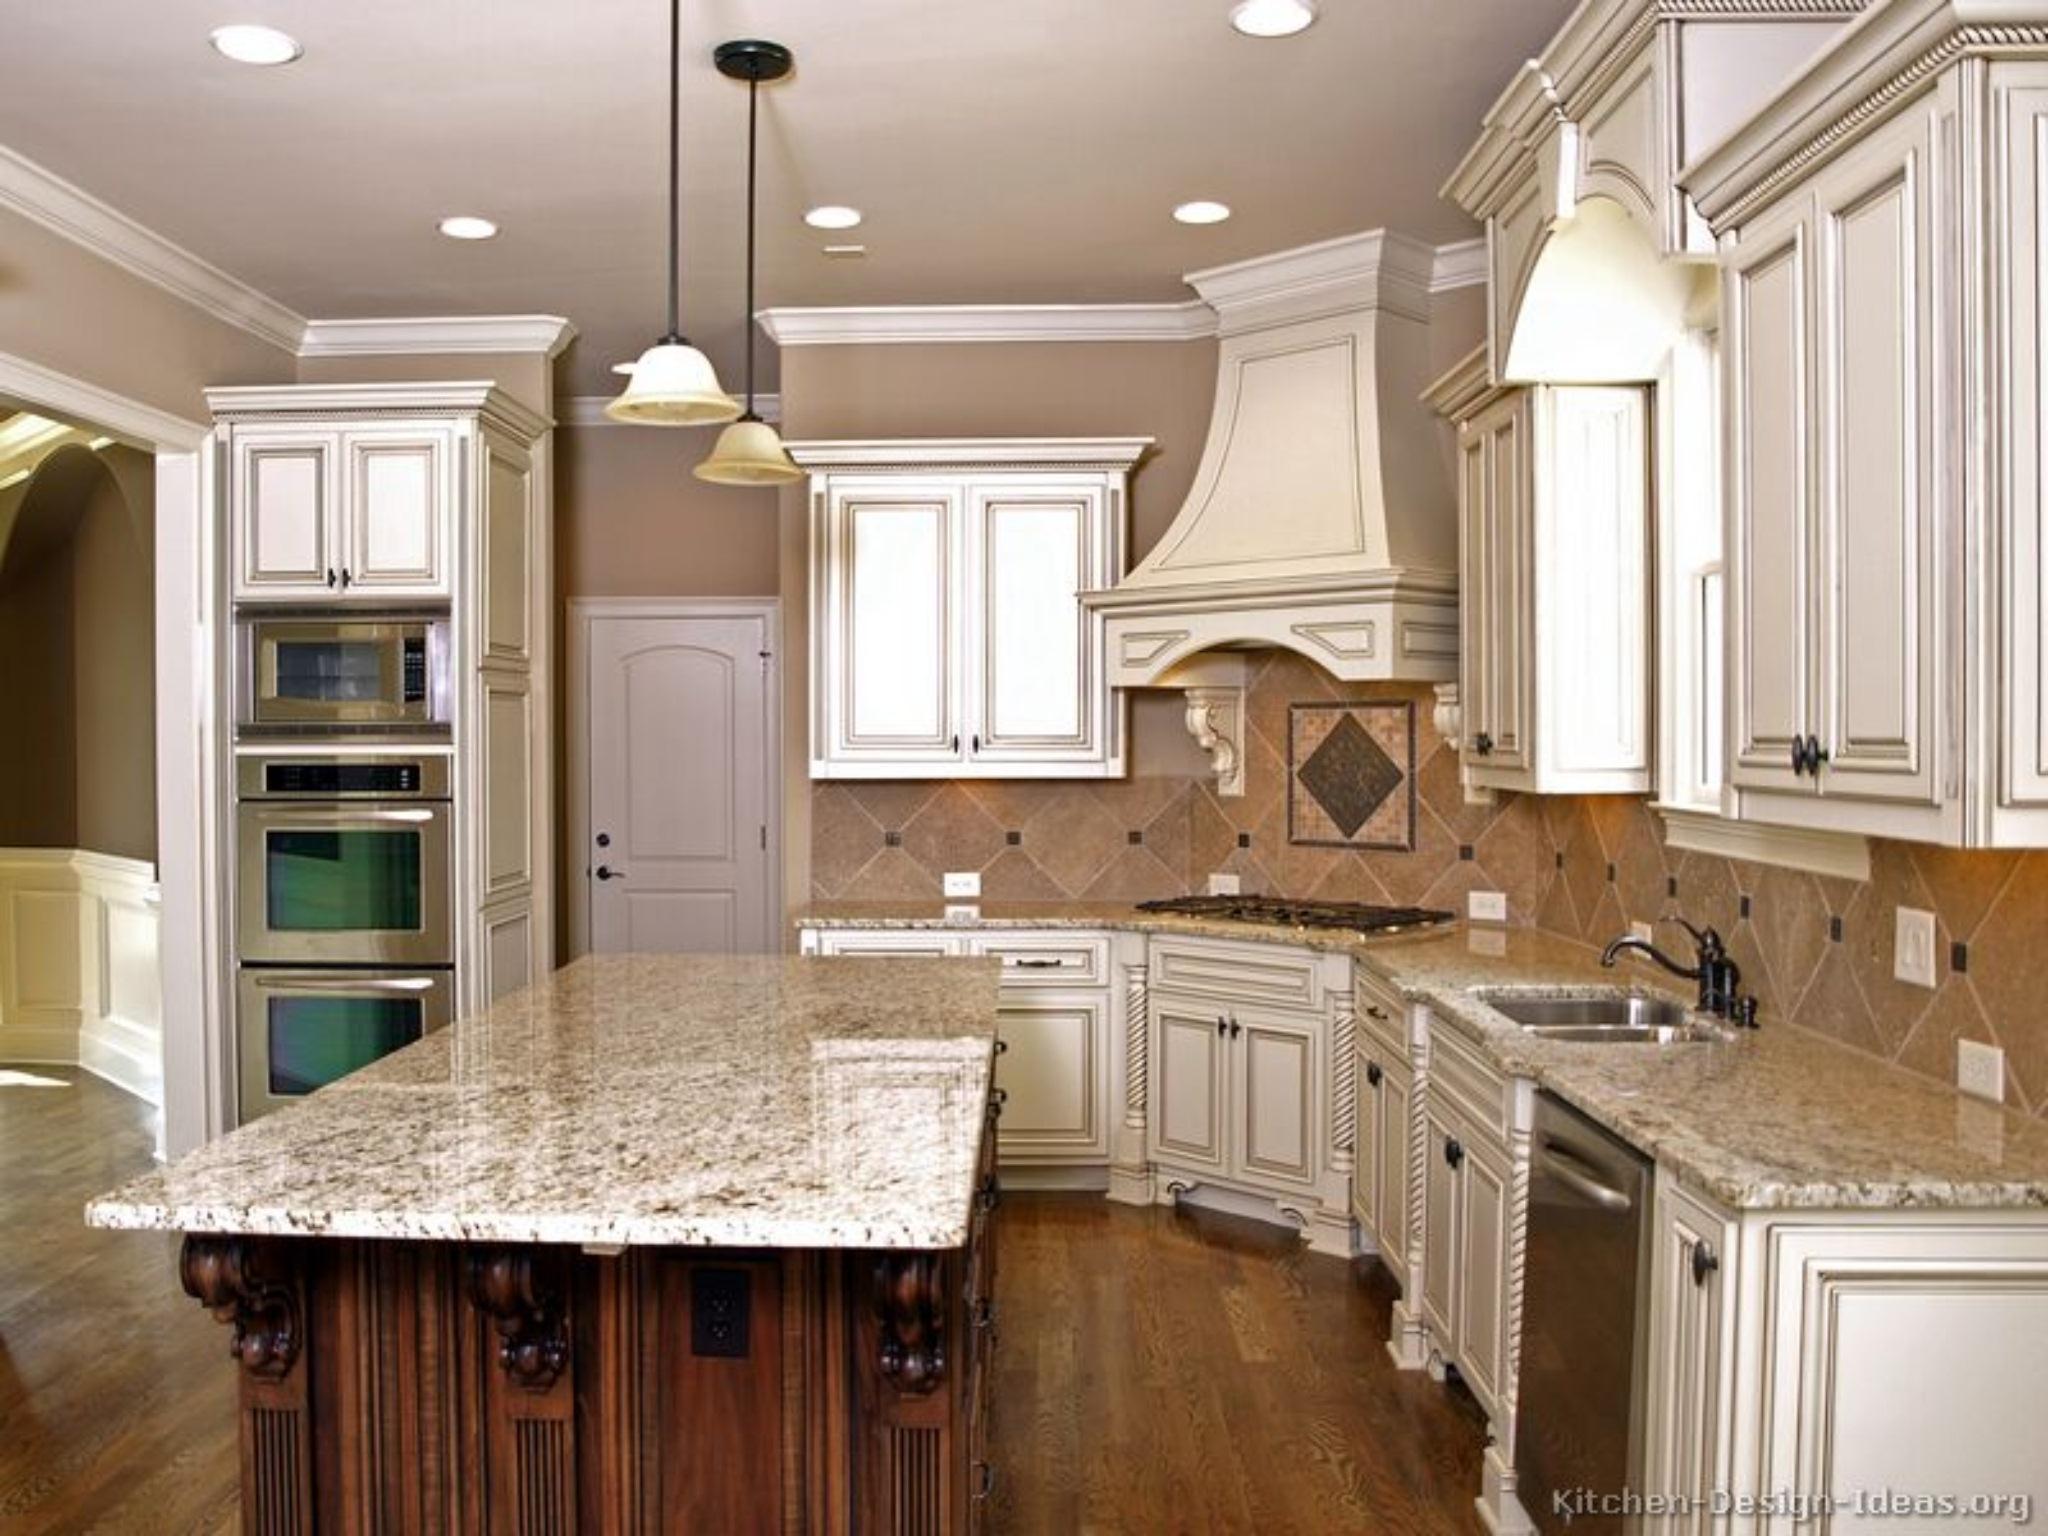 225 & Antique White Kitchen Cabinets - Visual Hunt